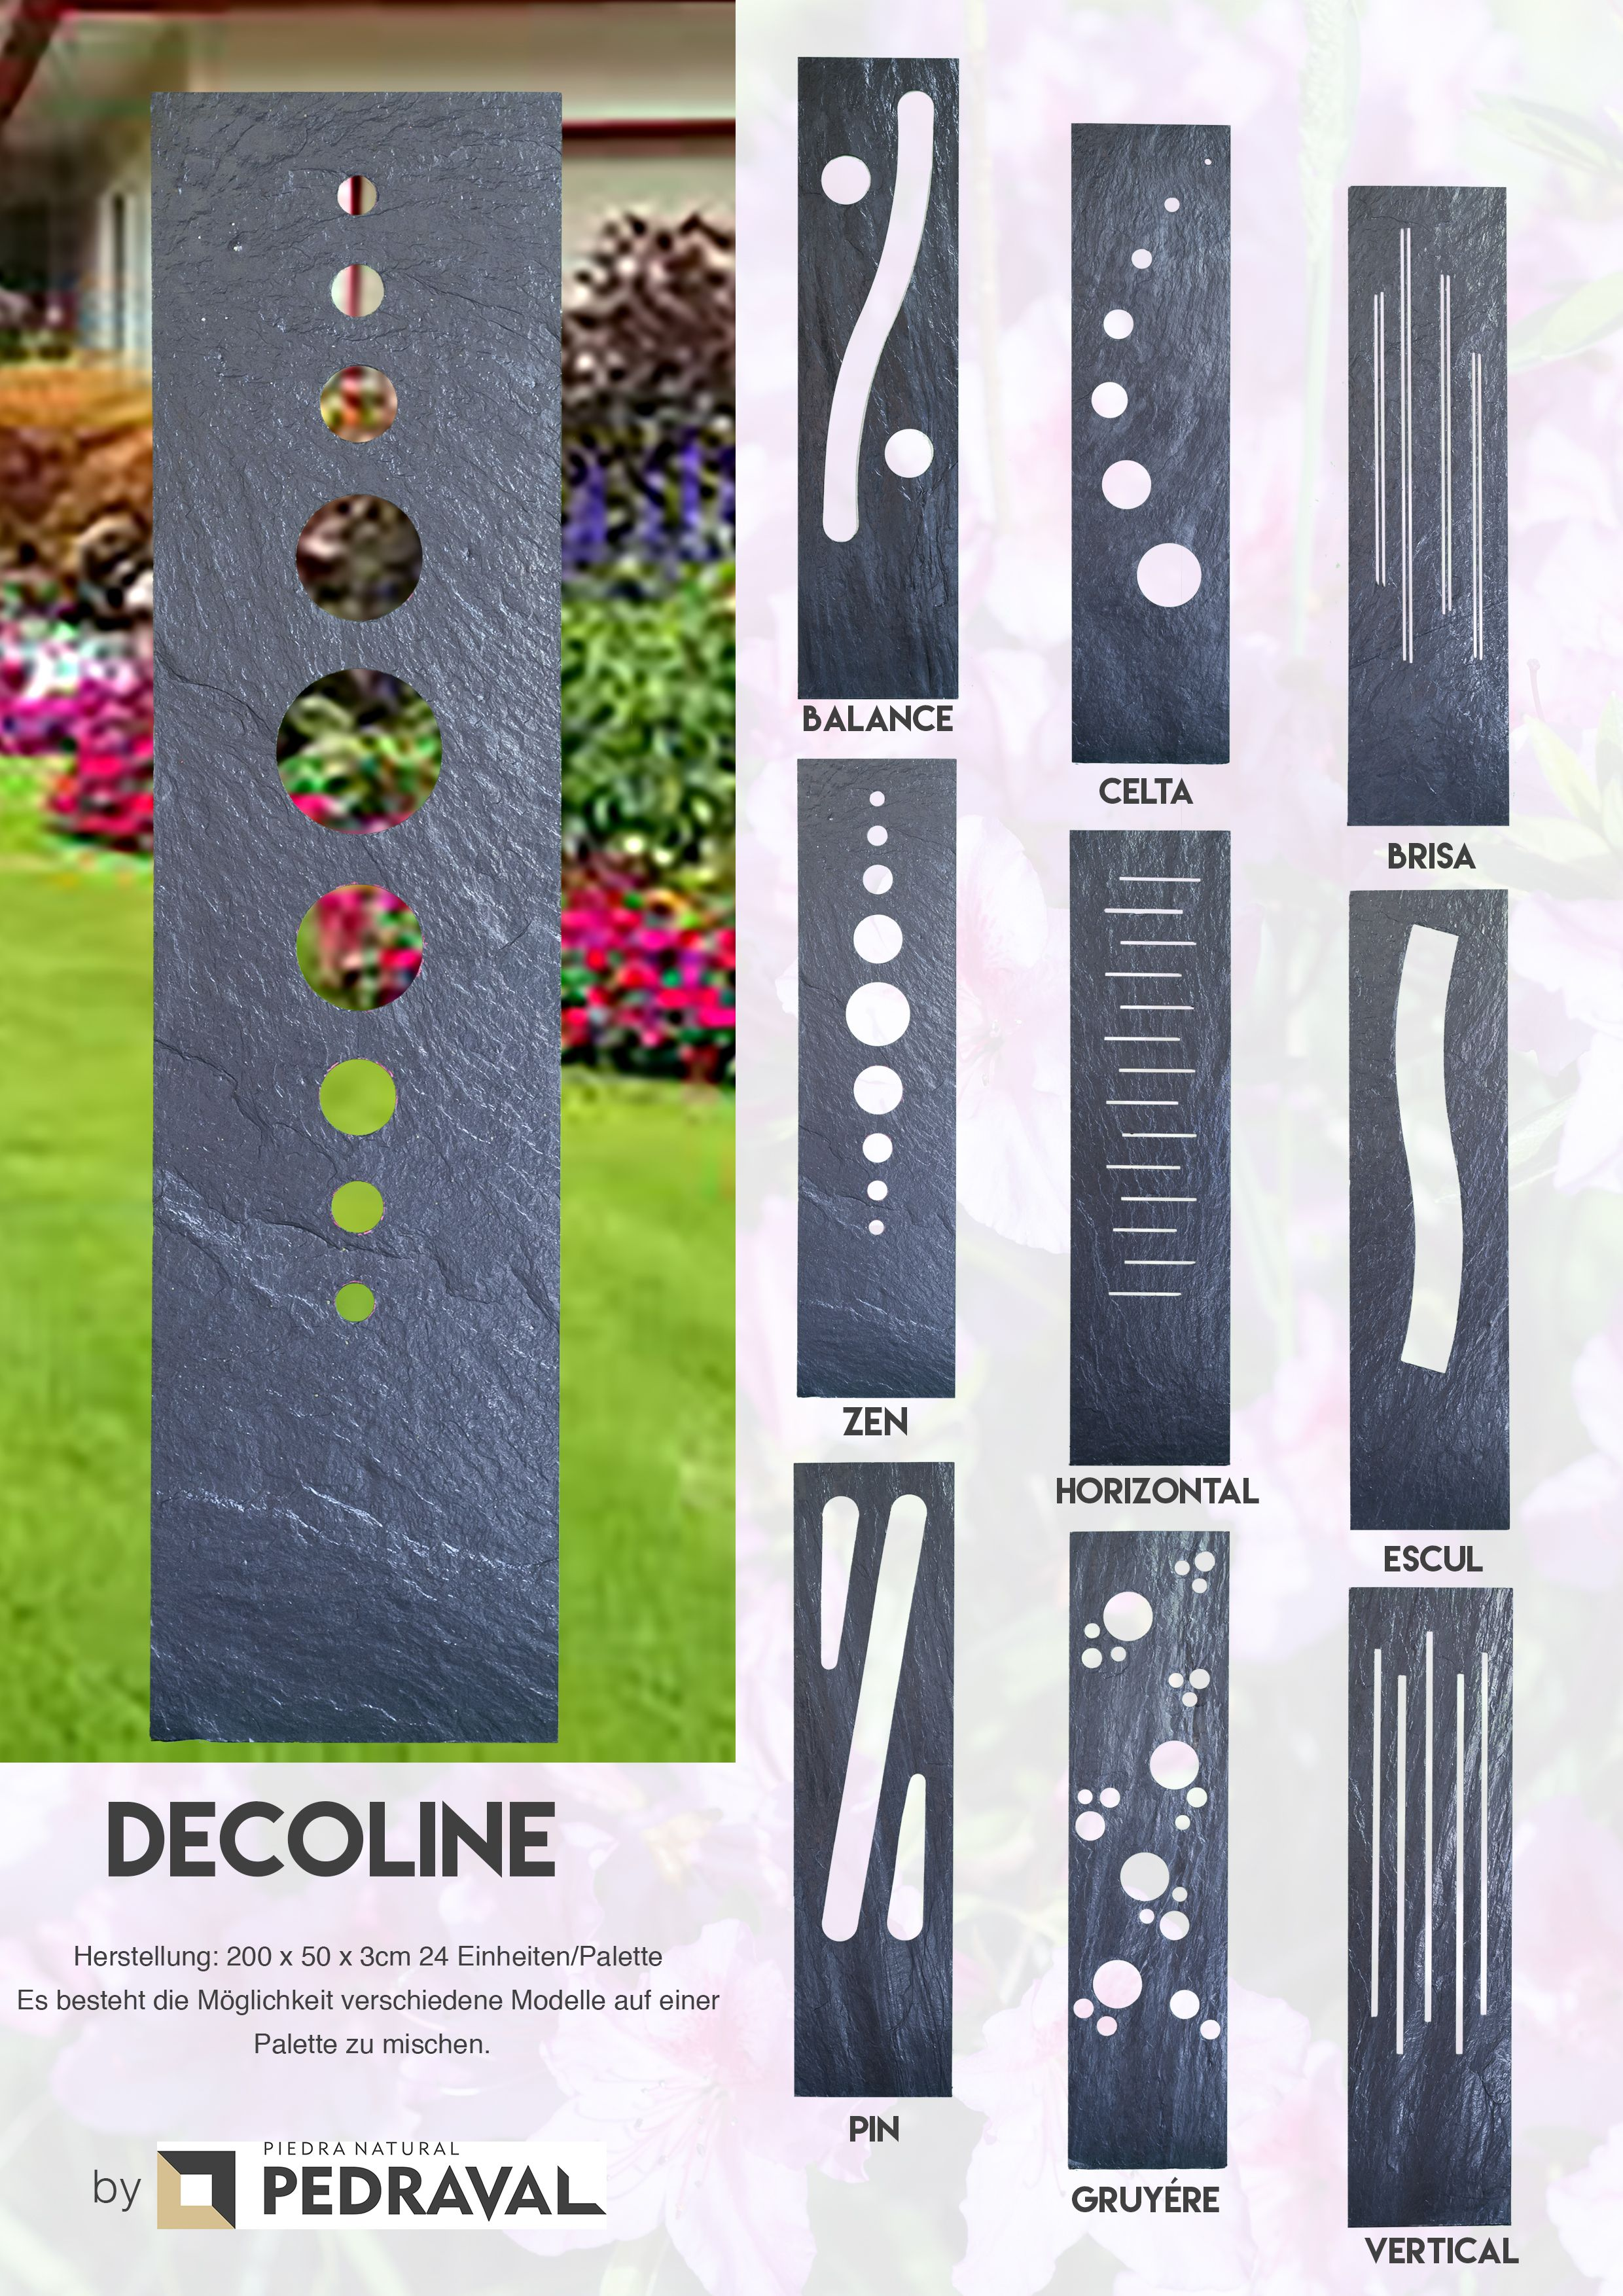 Einzigartig Gartendeko Kugeln Ideen